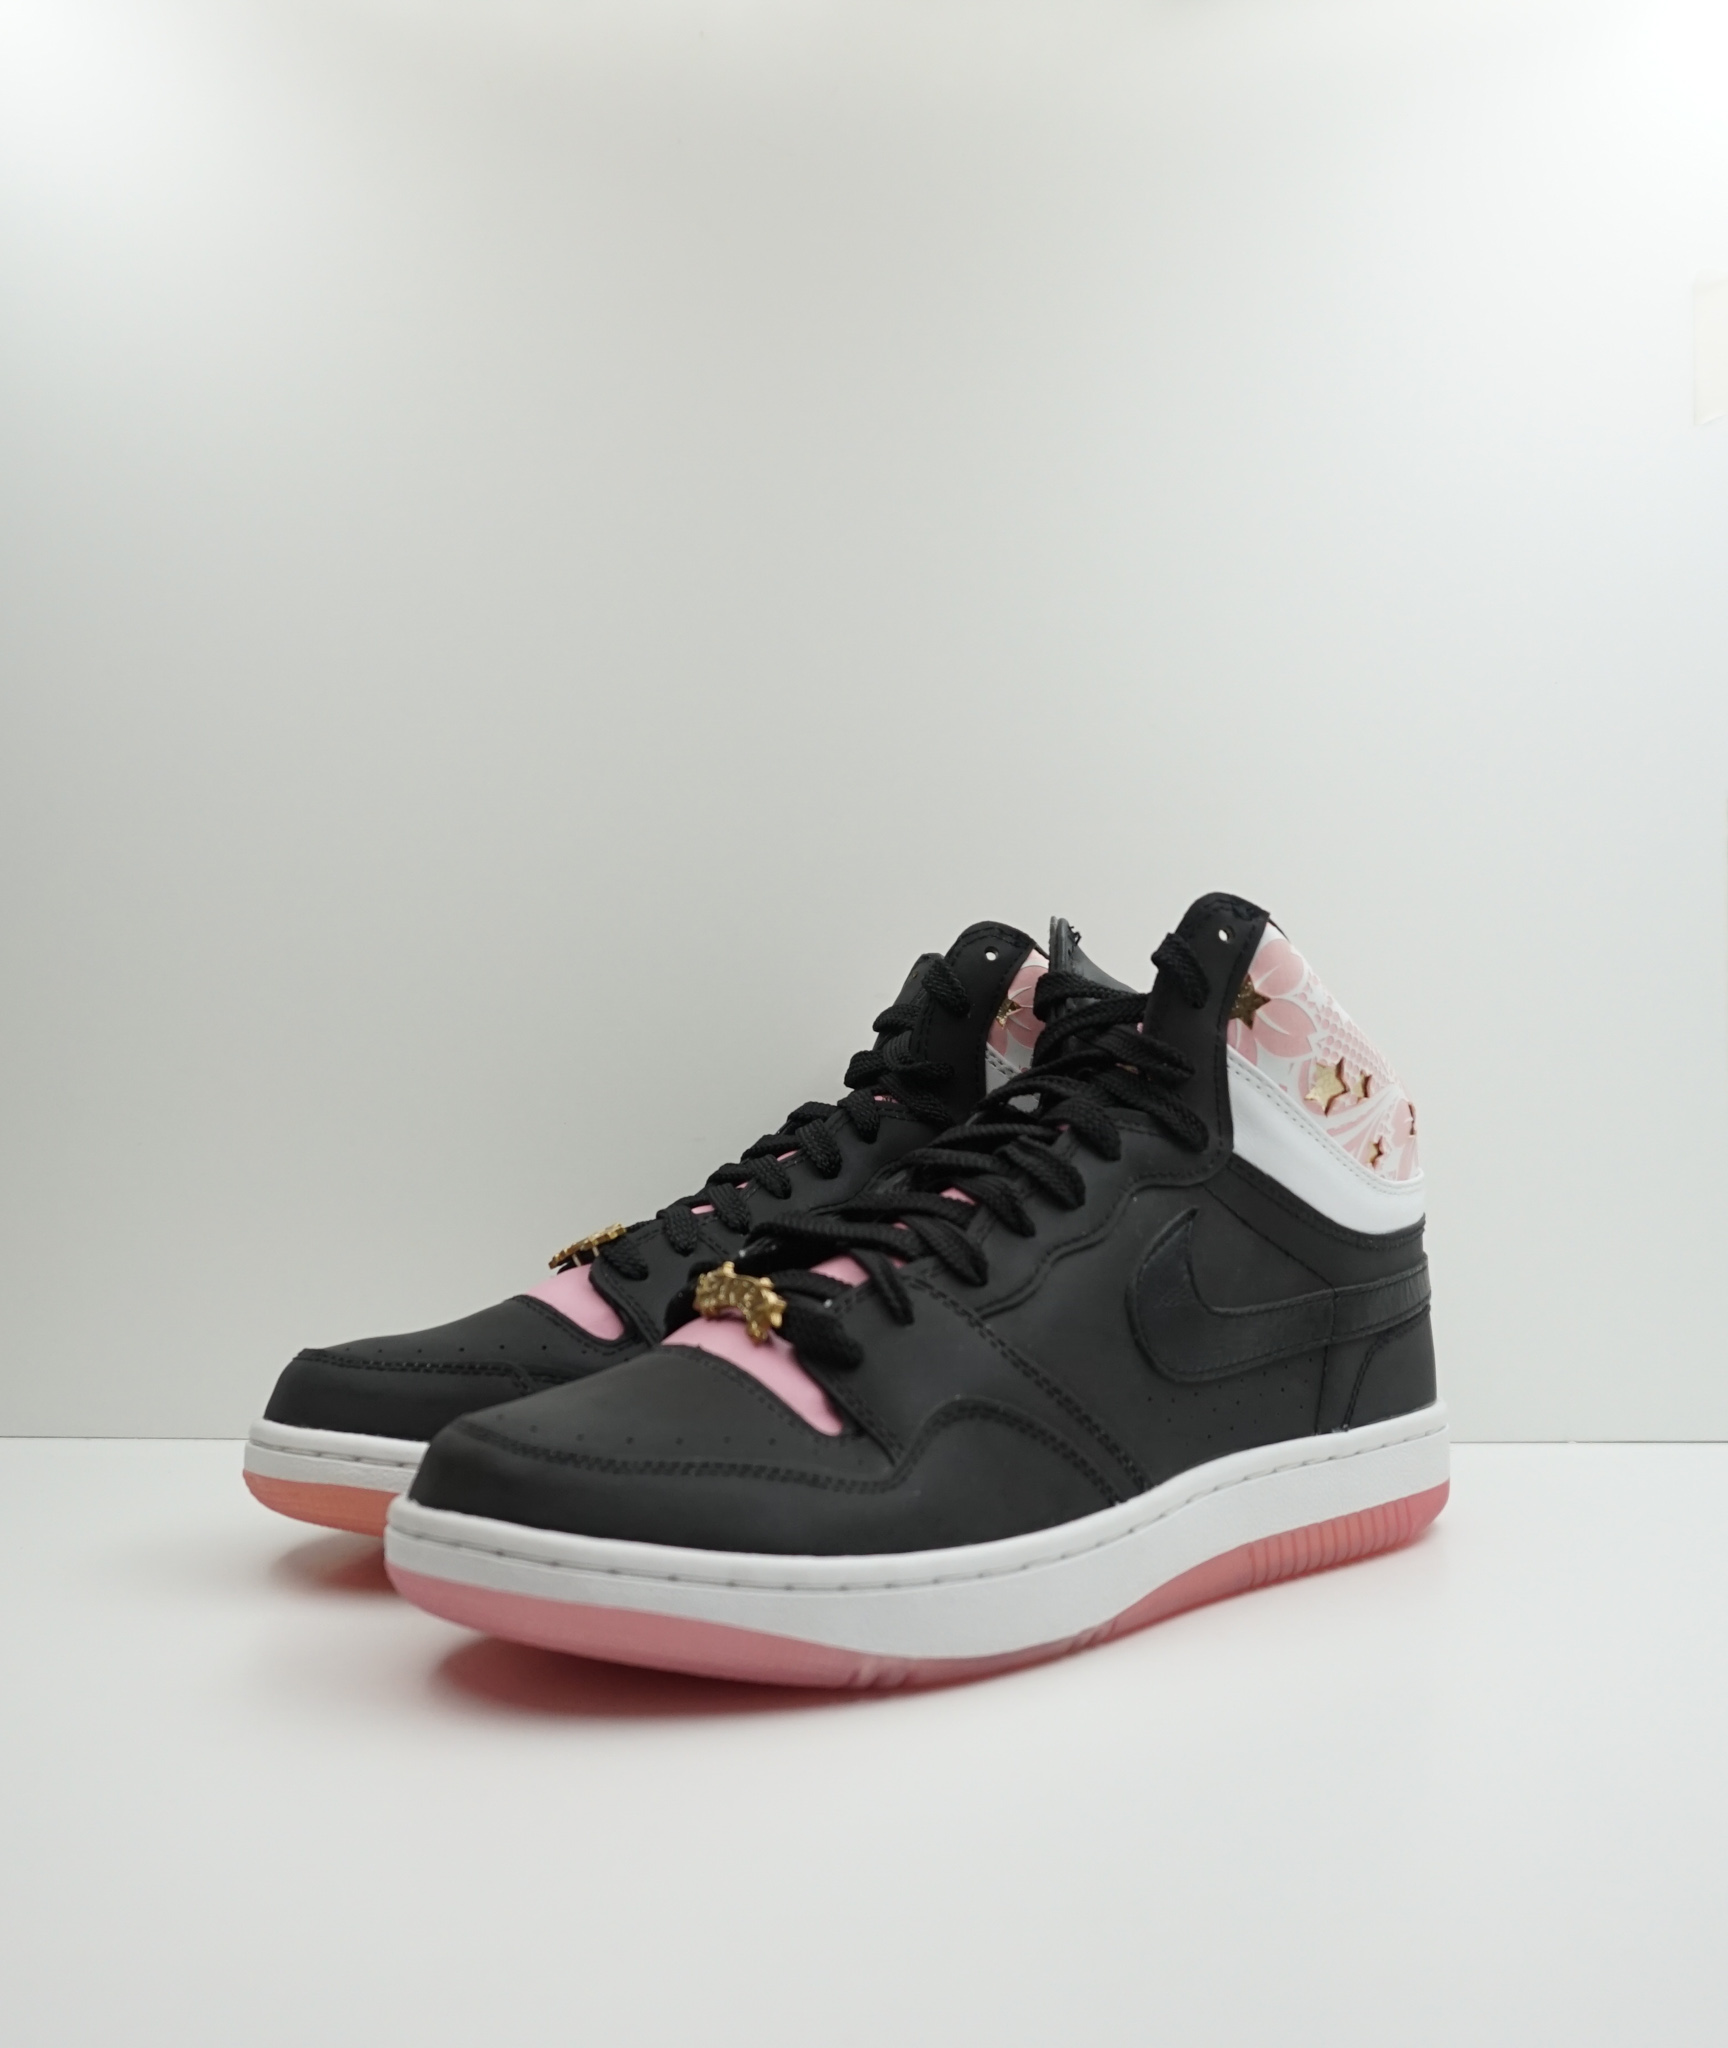 Nike Court Force Hi Premium Sakura Ueno